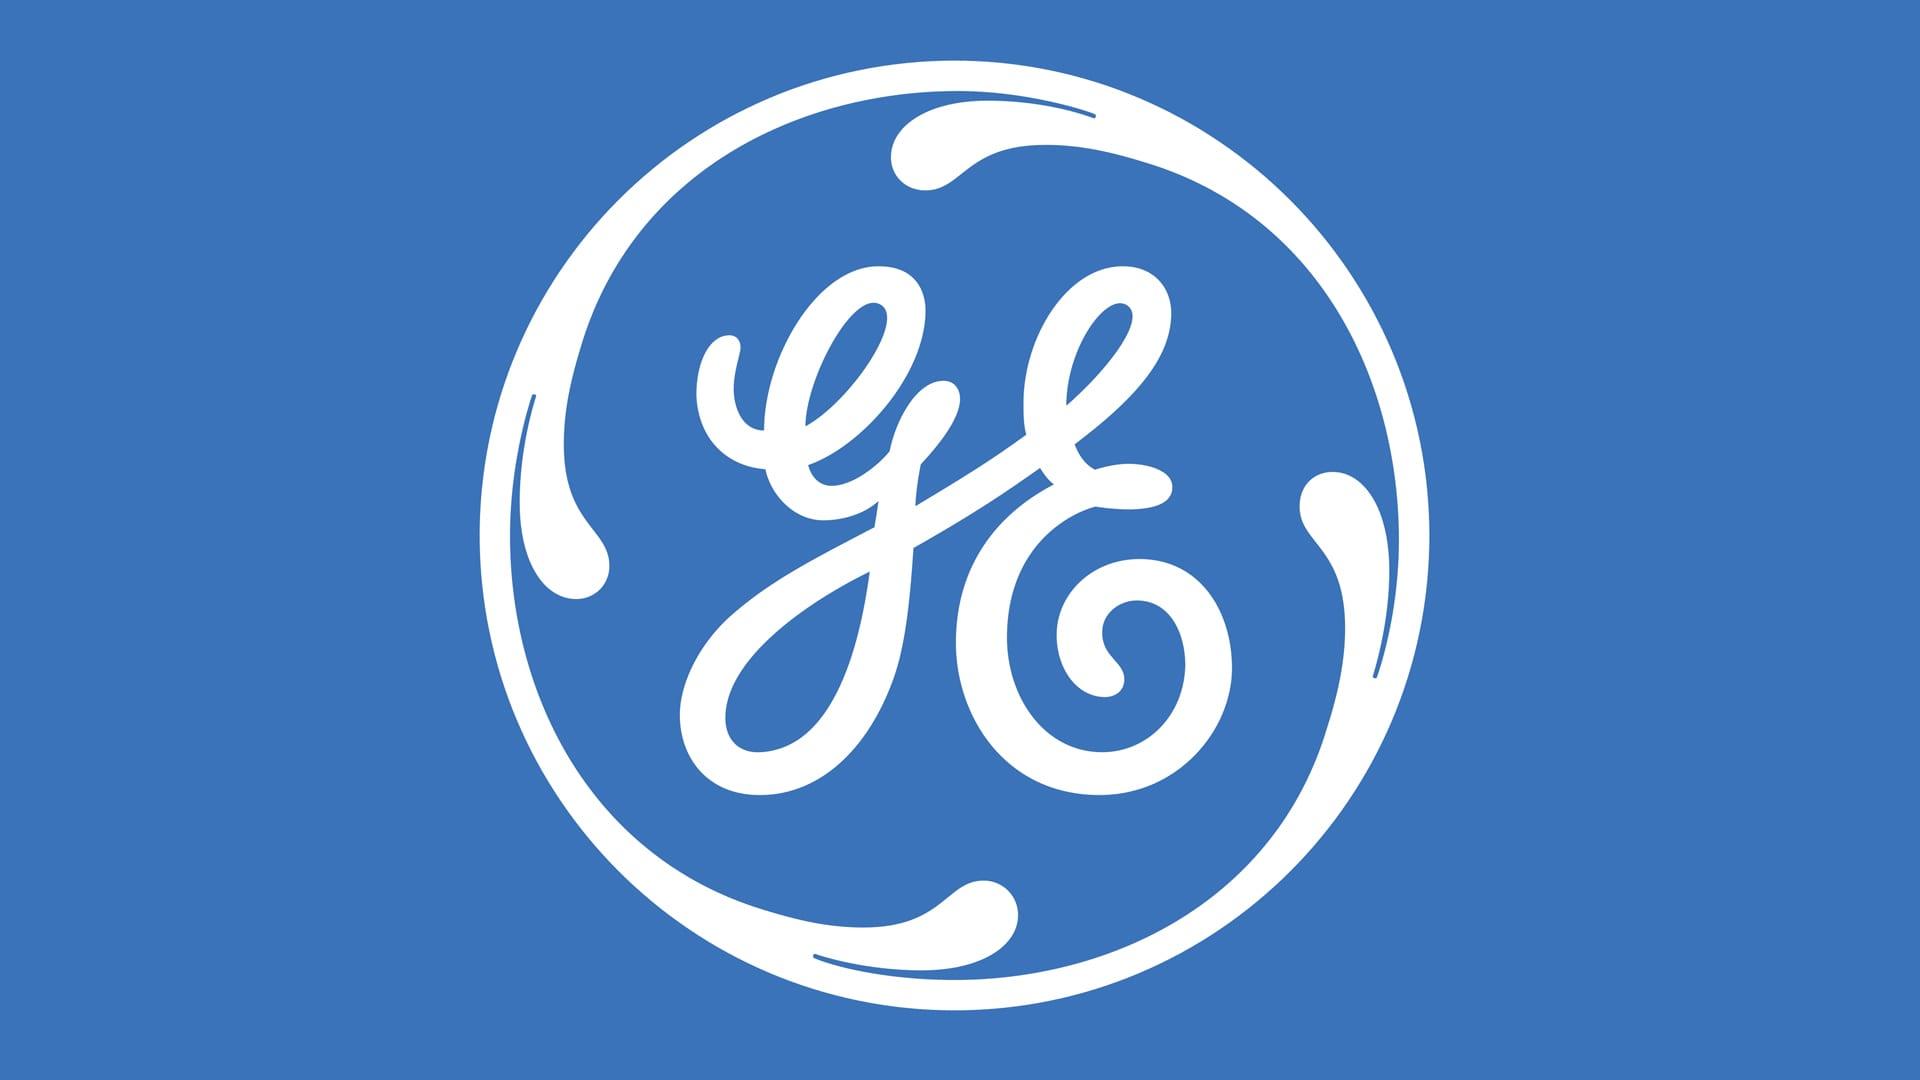 GE-symbol